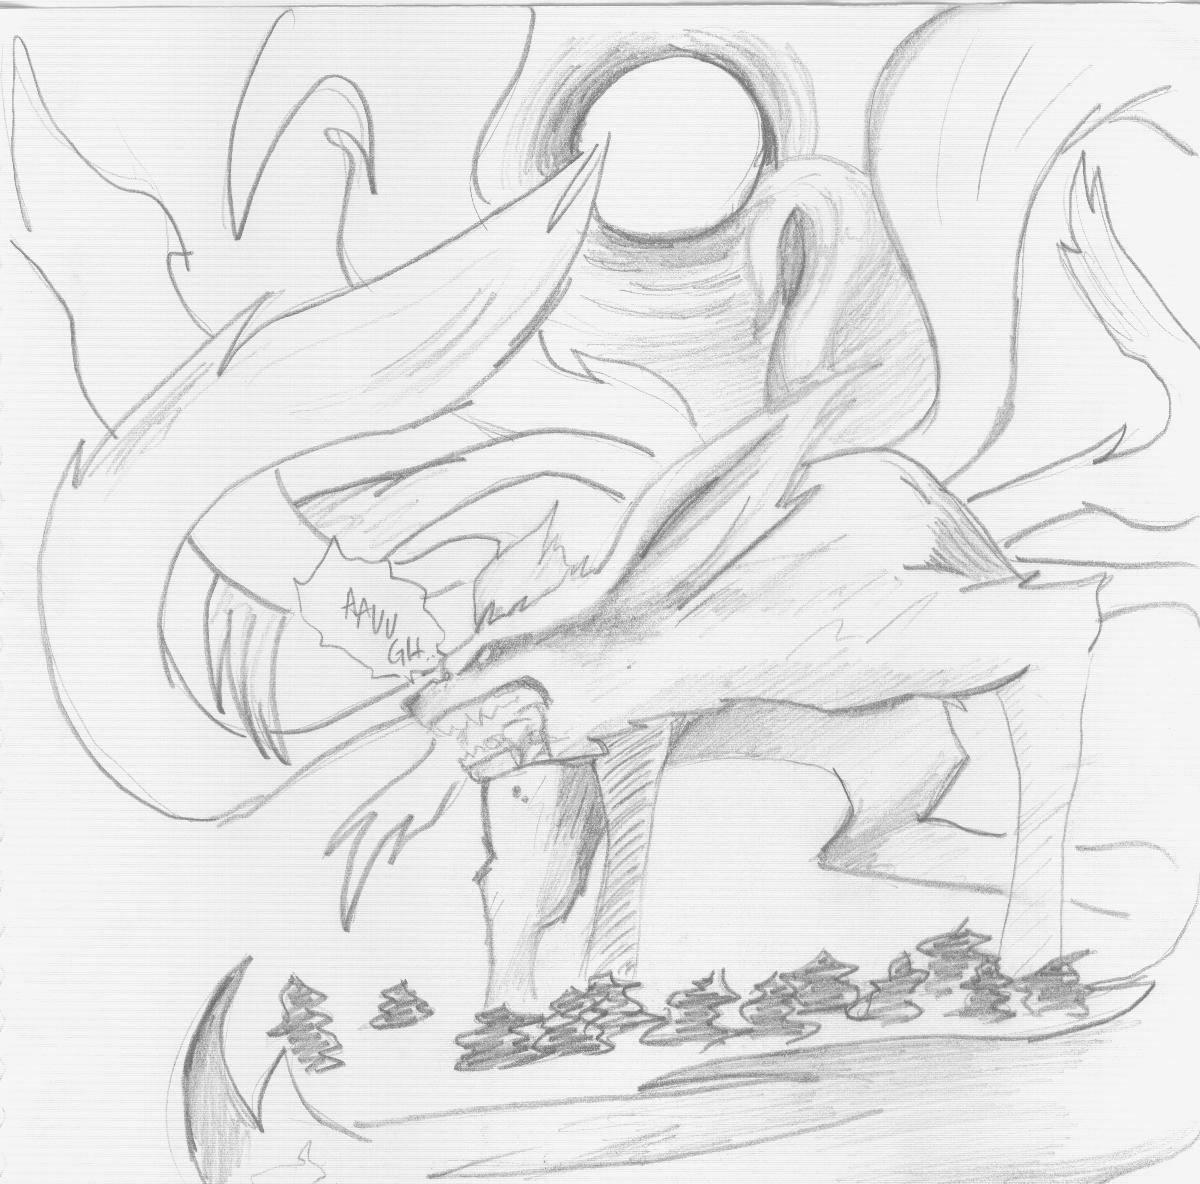 Nine-Tailed Fox Demon By Spntaneousprose On DeviantArt